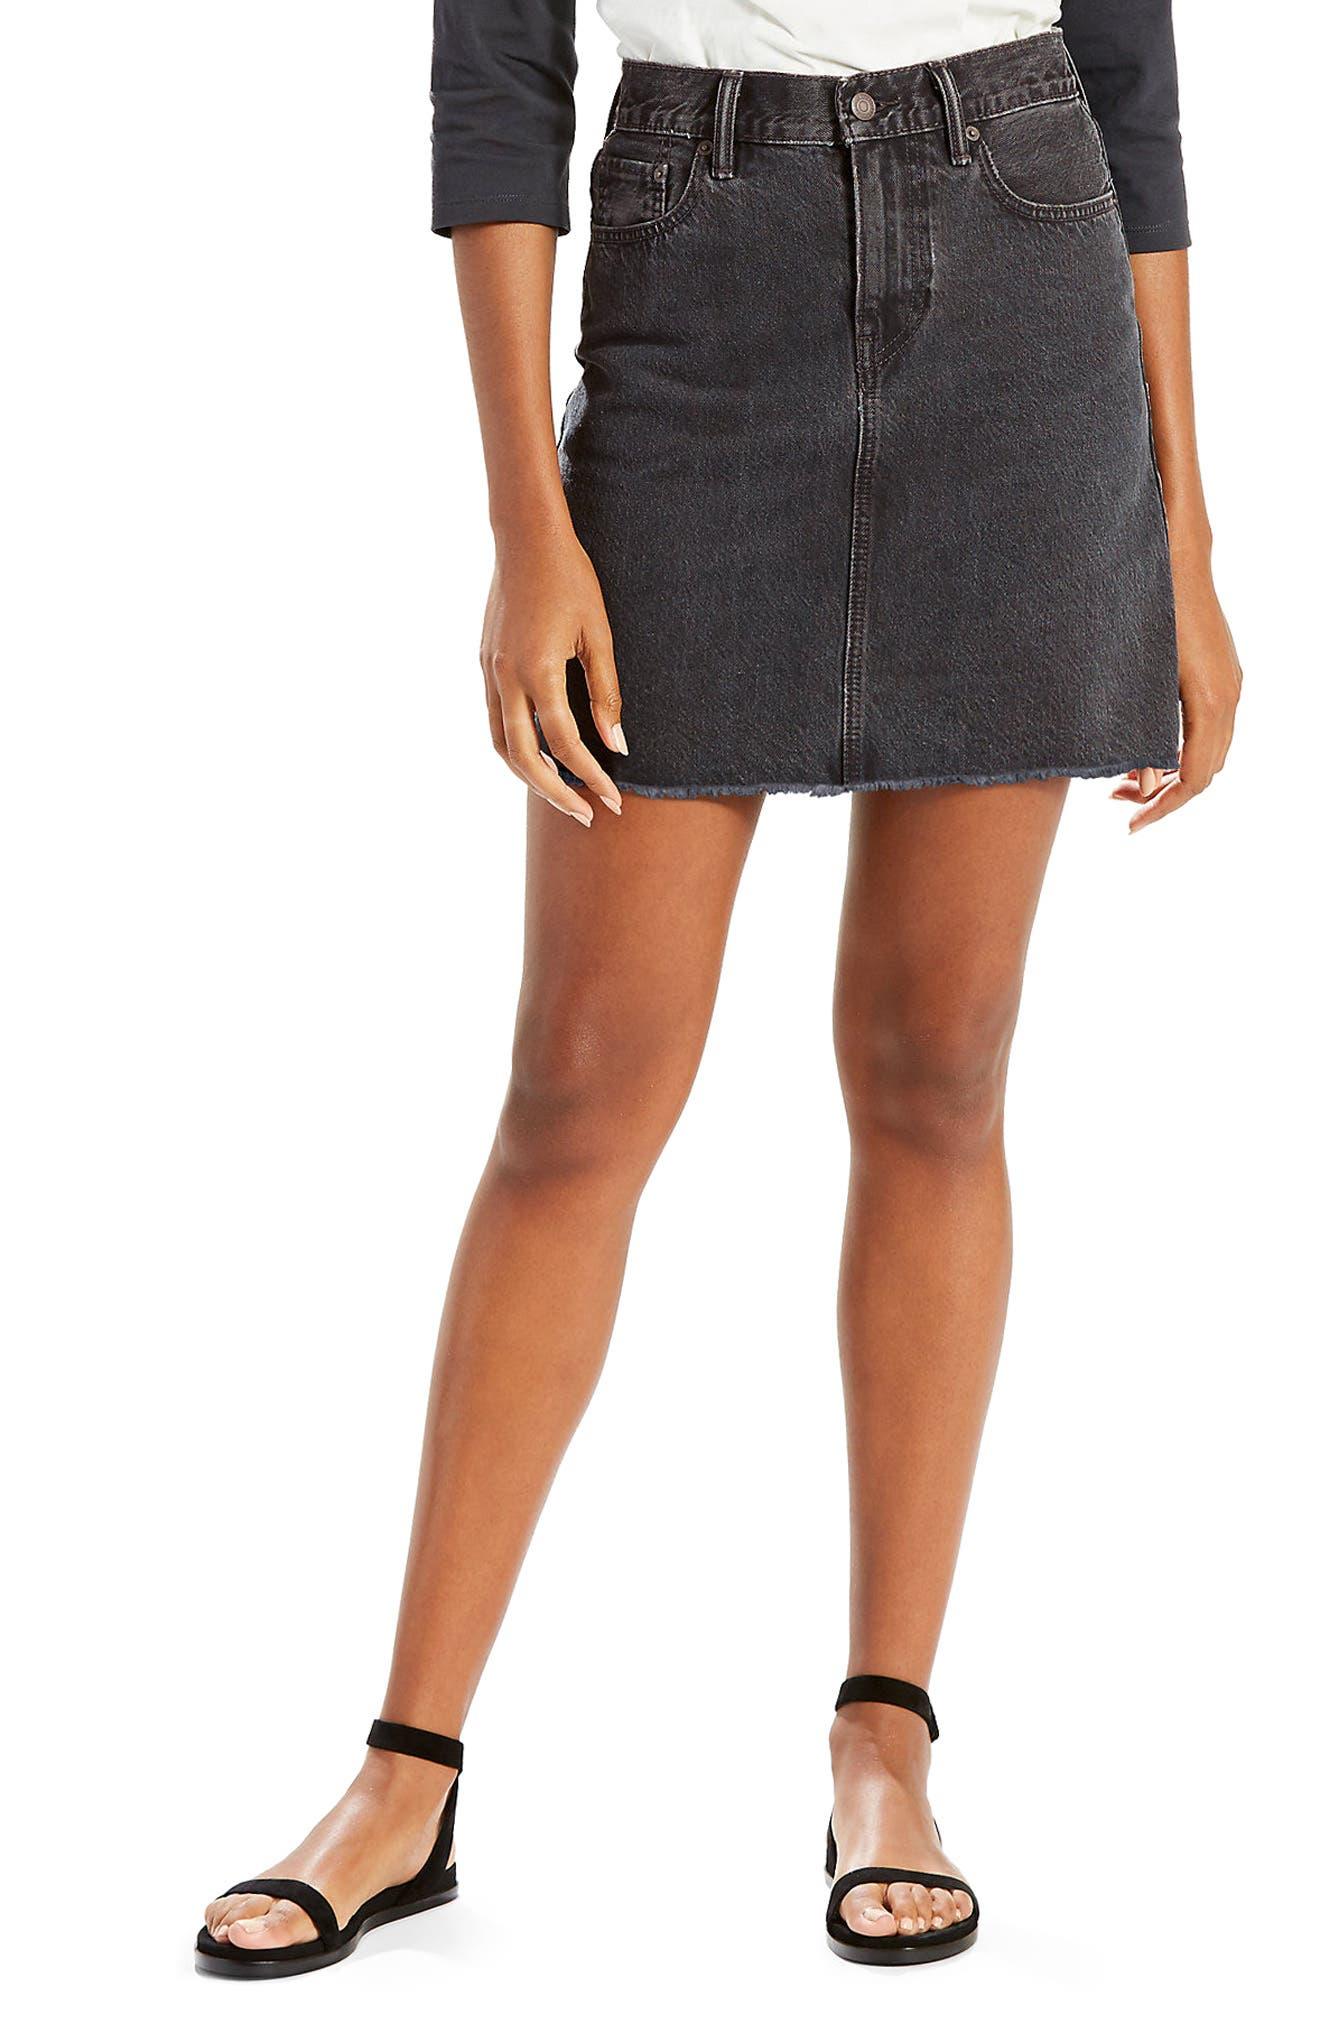 Everyday Denim Skirt,                         Main,                         color, Mixed Tape Washed Black Denim